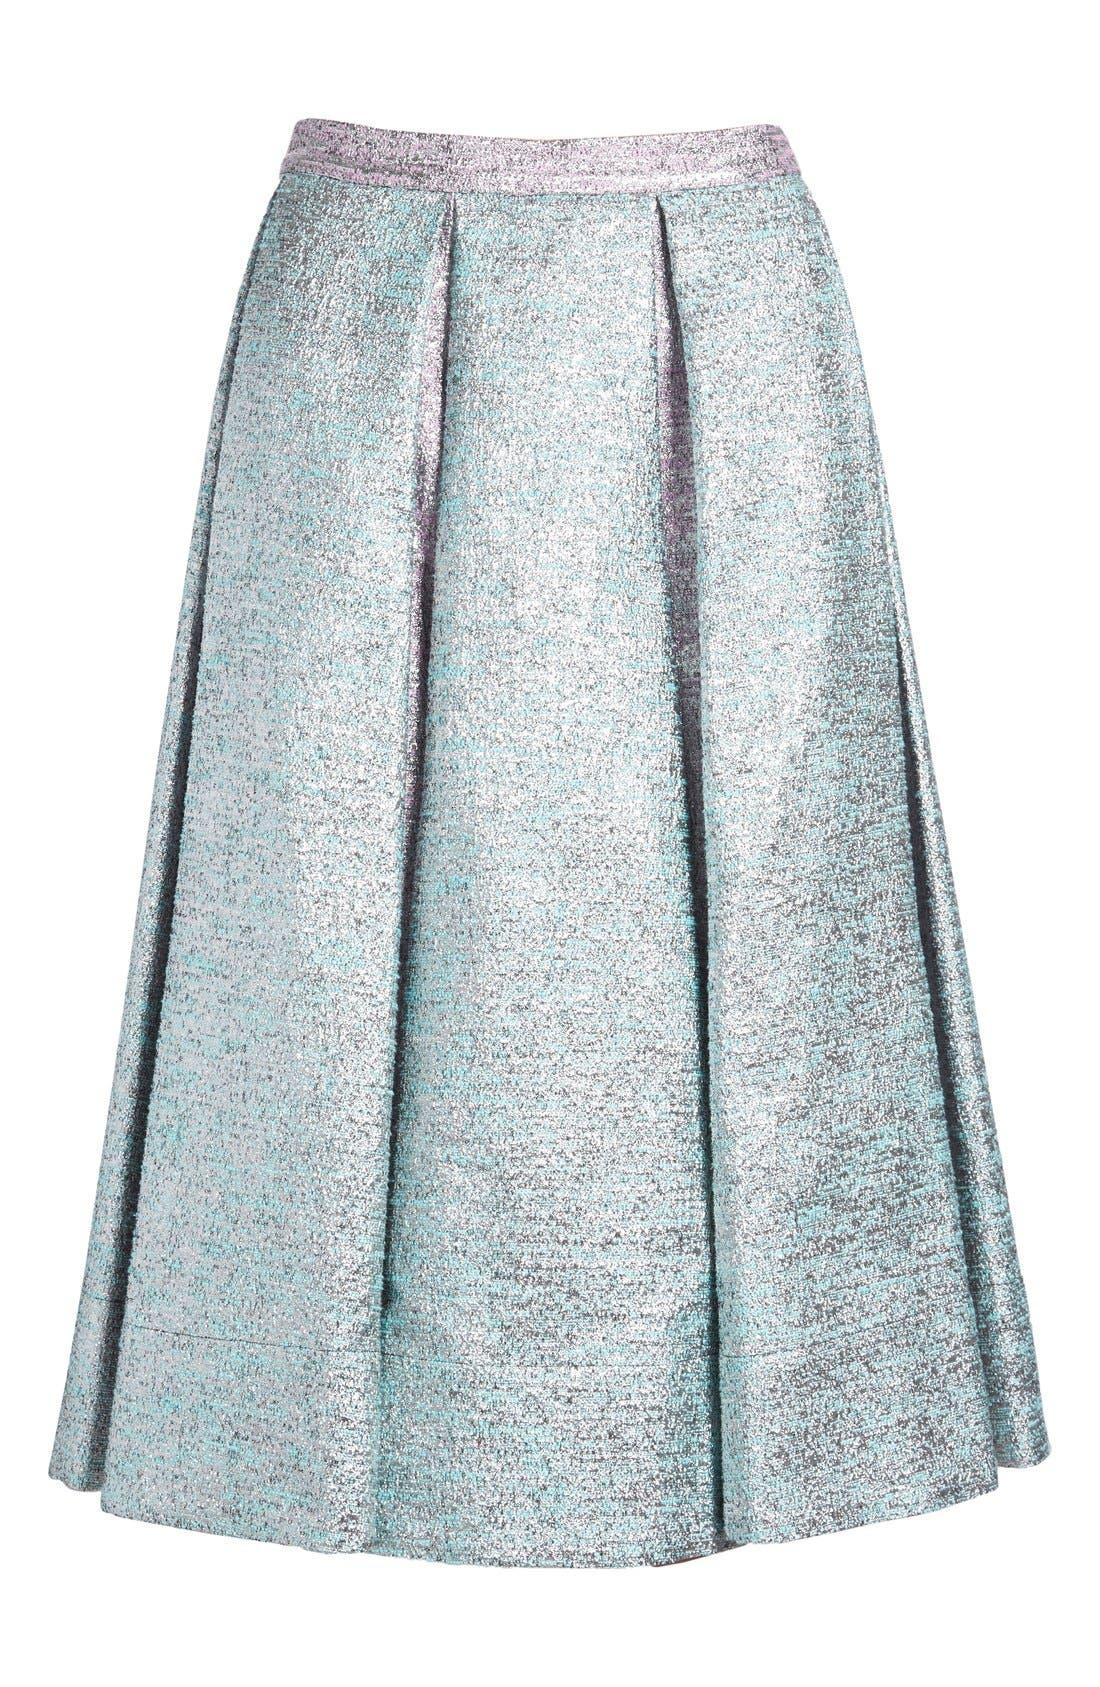 Alternate Image 4  - PASKAL Metallic Inverted Pleat Flared Skirt